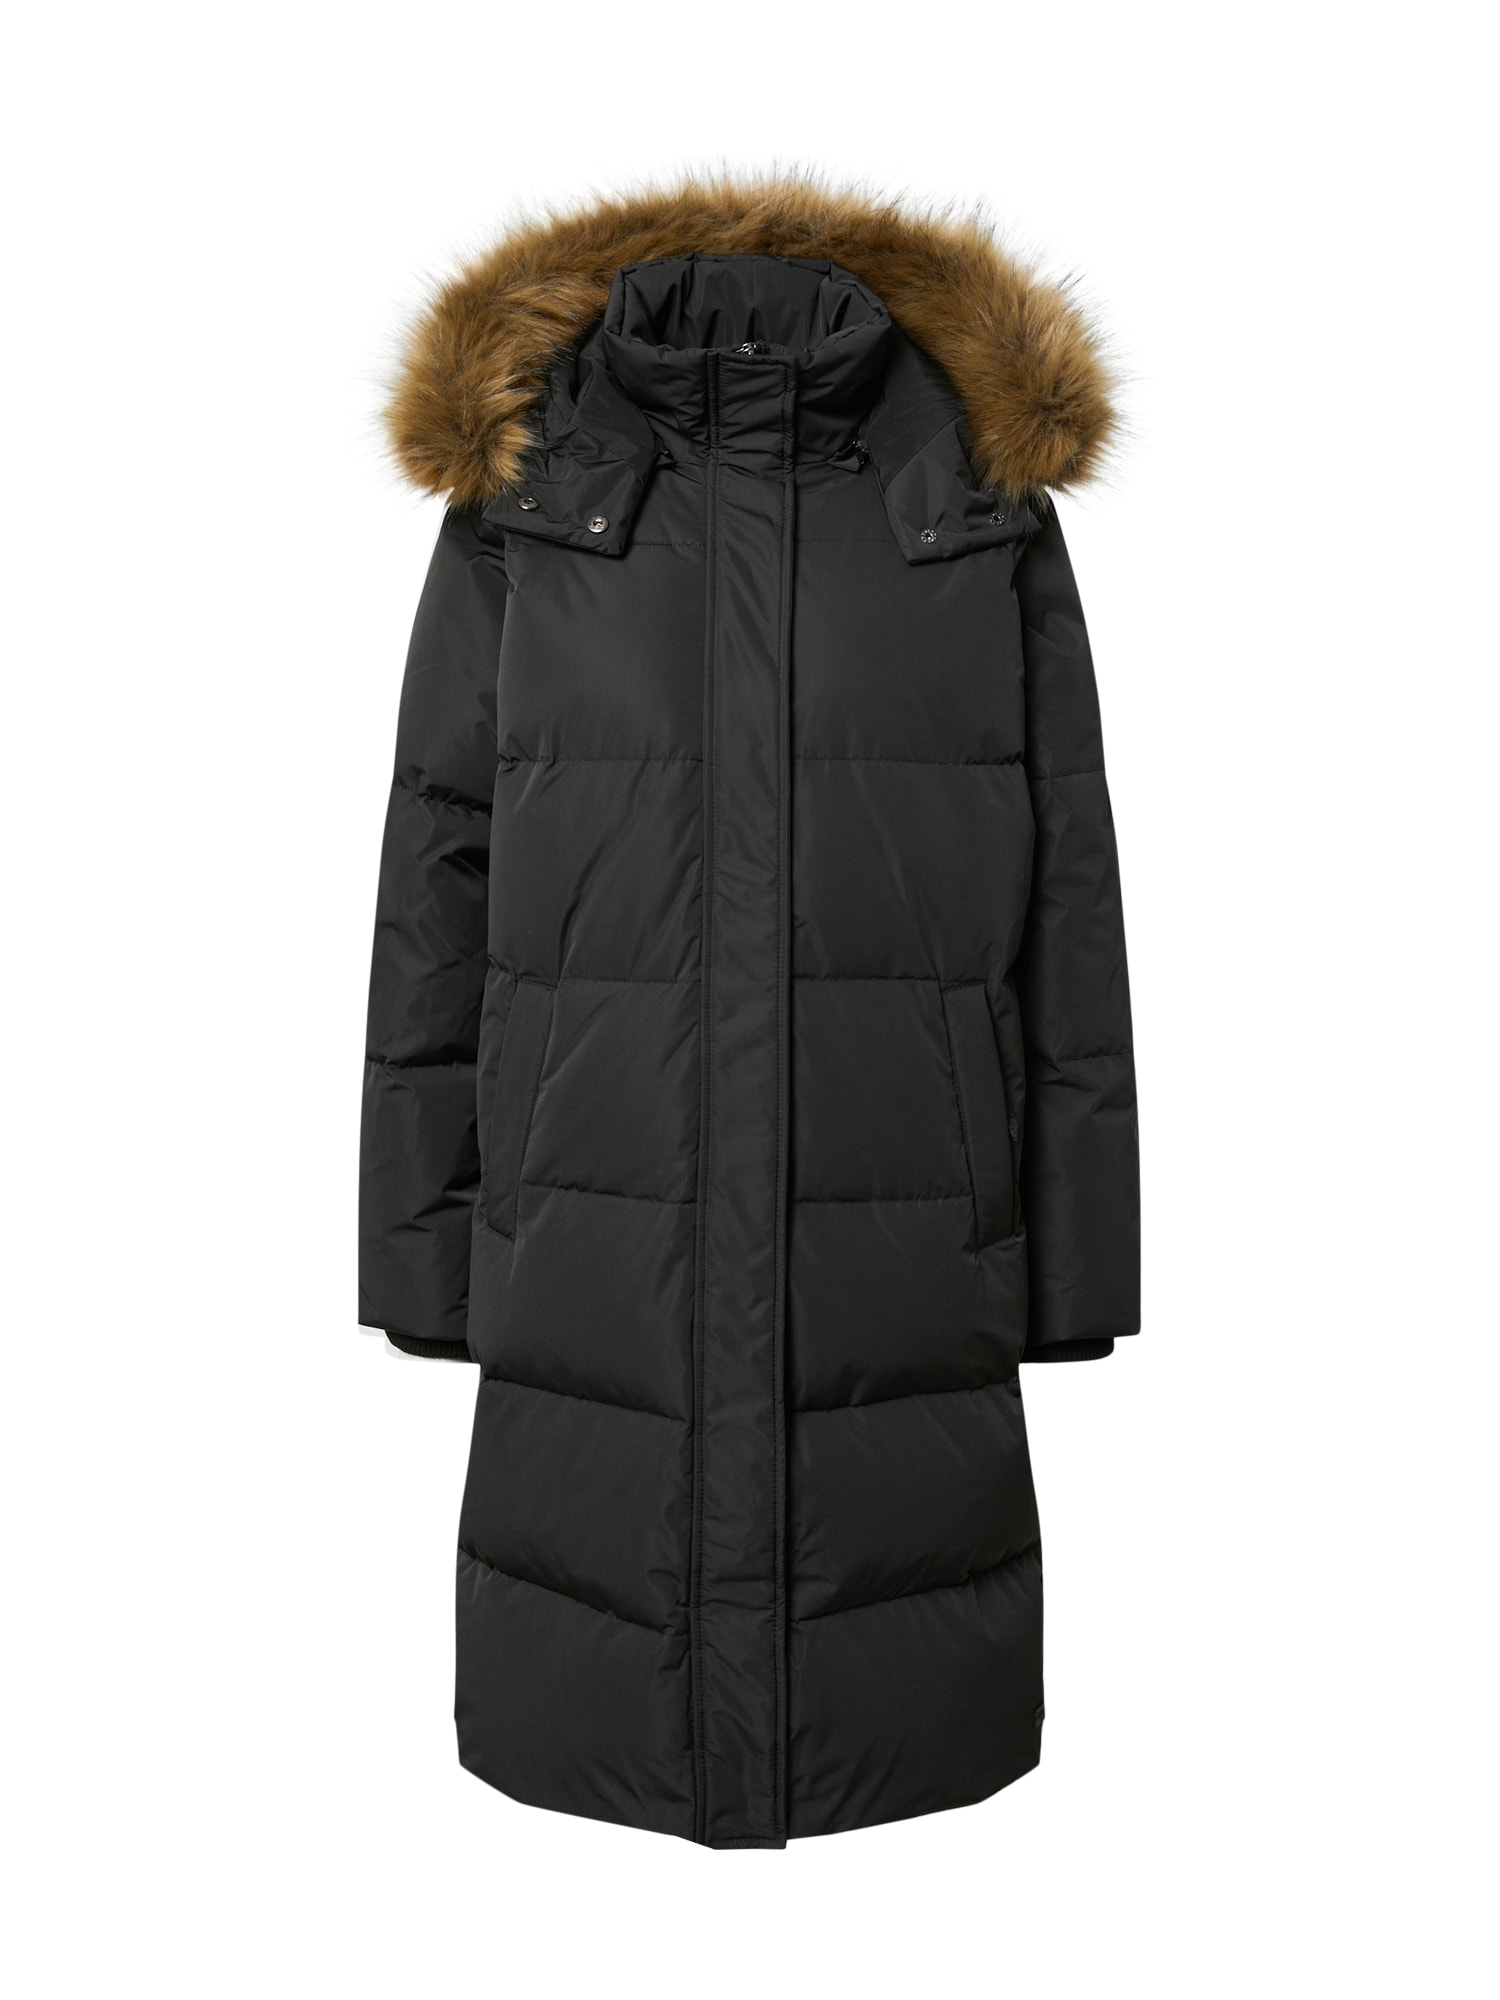 MOSS COPENHAGEN Žieminis paltas juoda